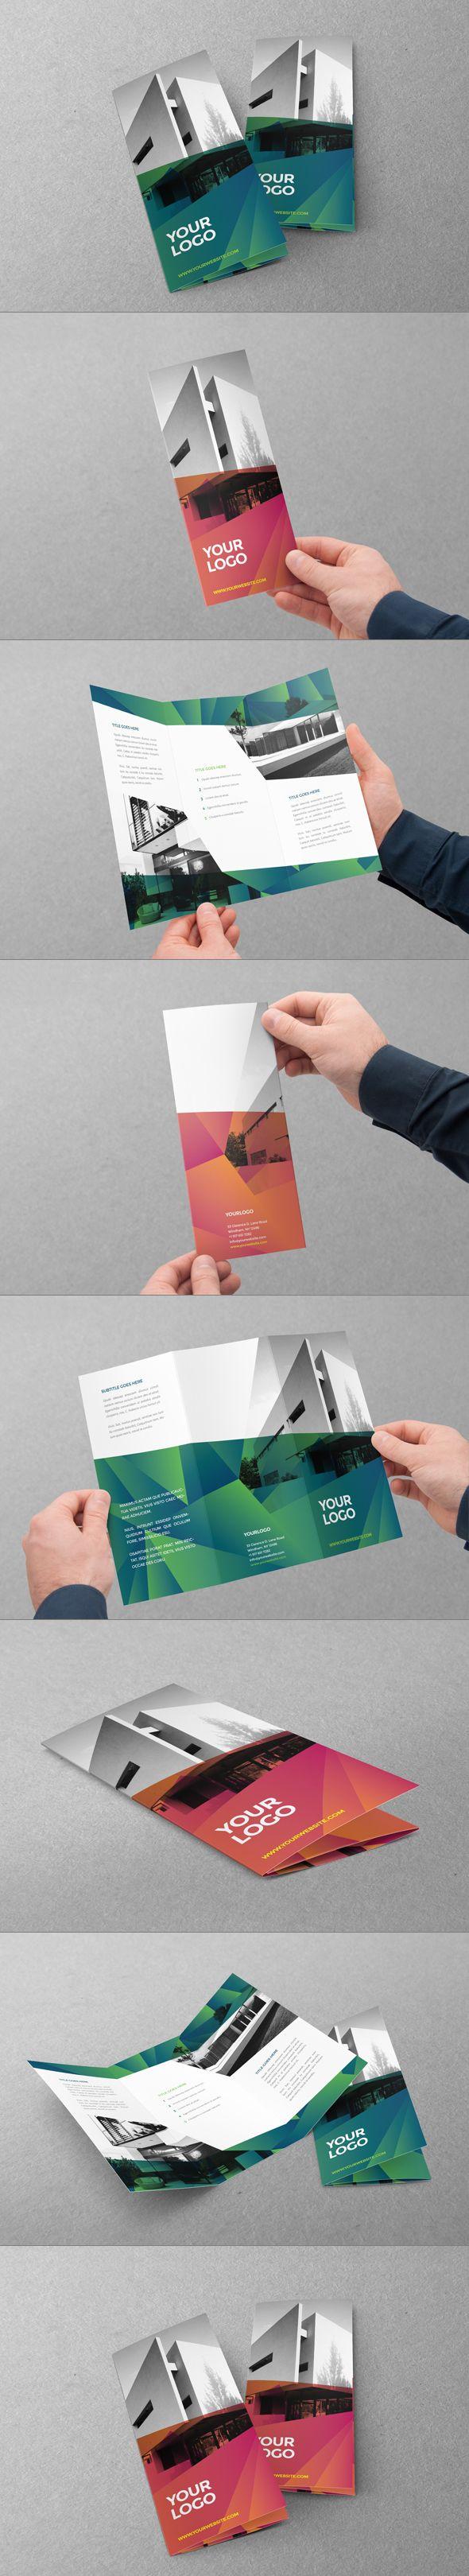 Modern Green Orange Trifold by Abra Design, via Behance